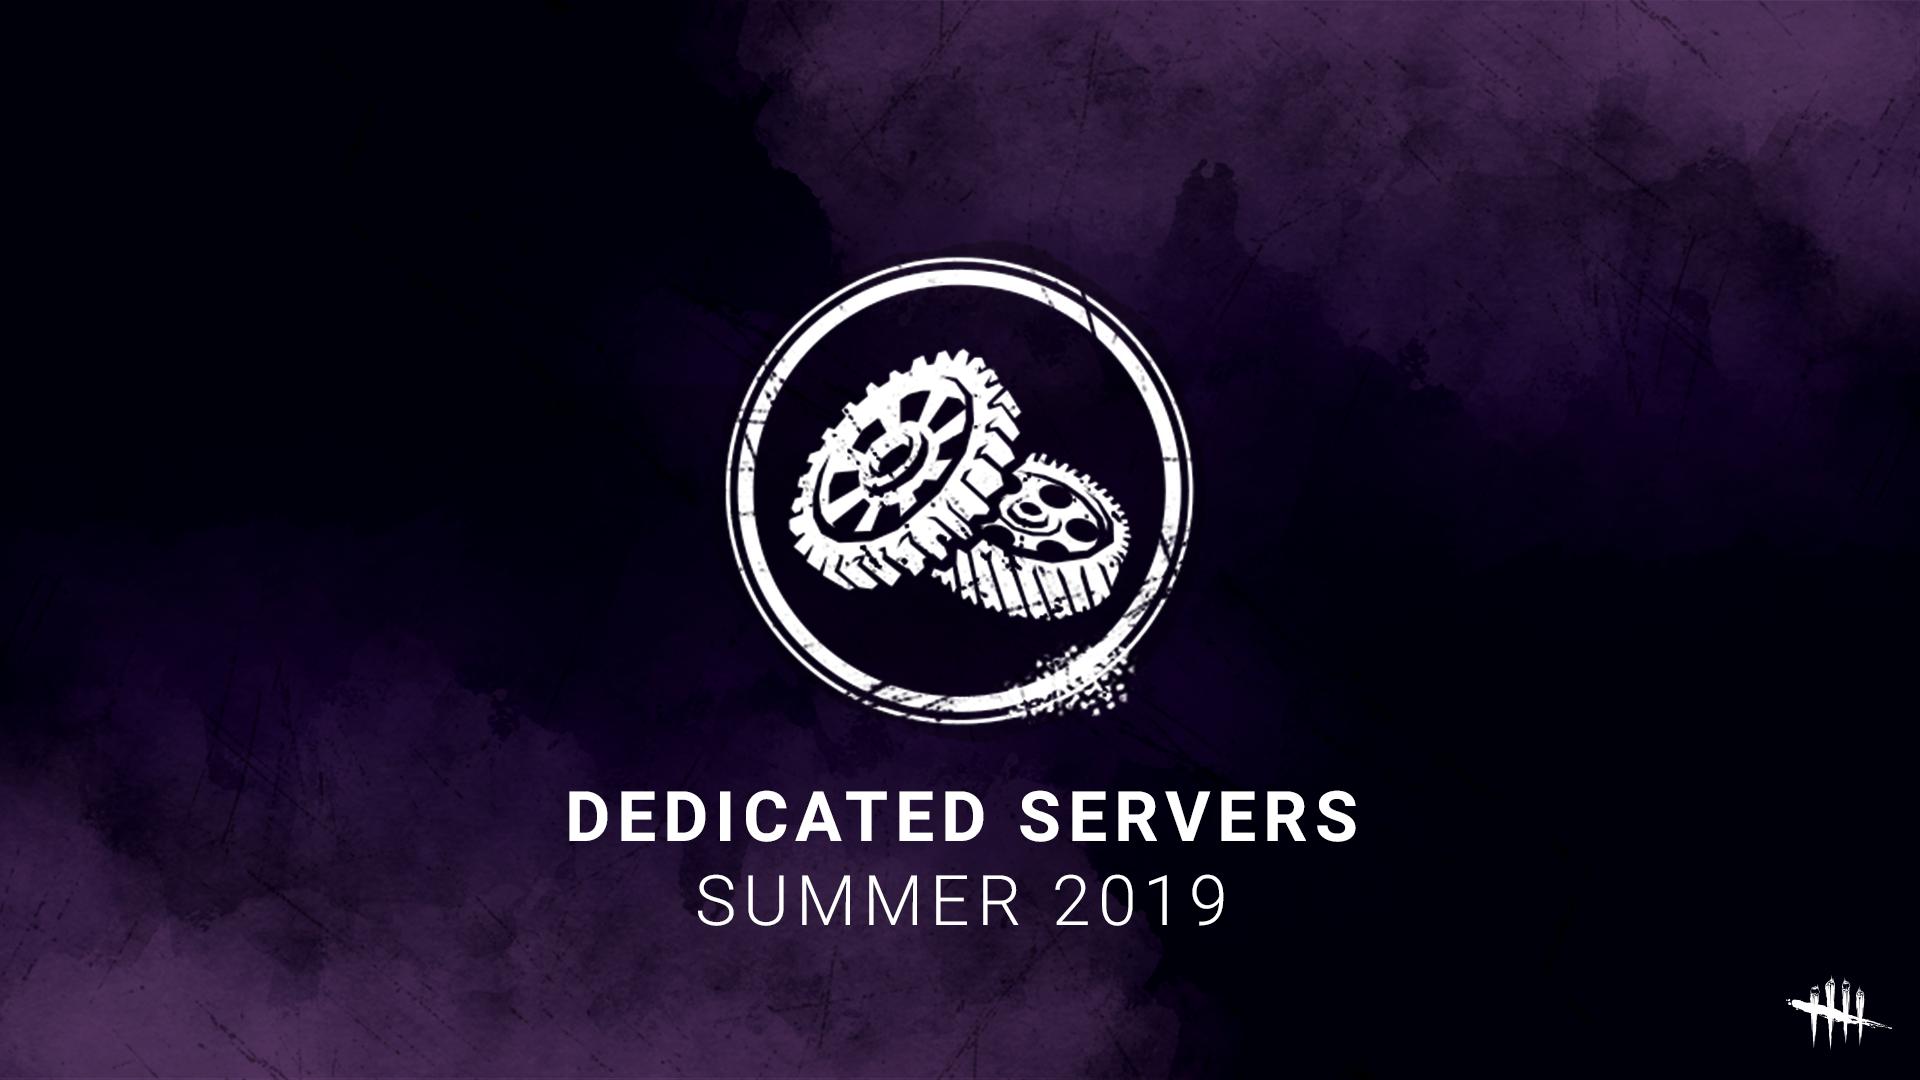 Dedicated servers dead by daylight s